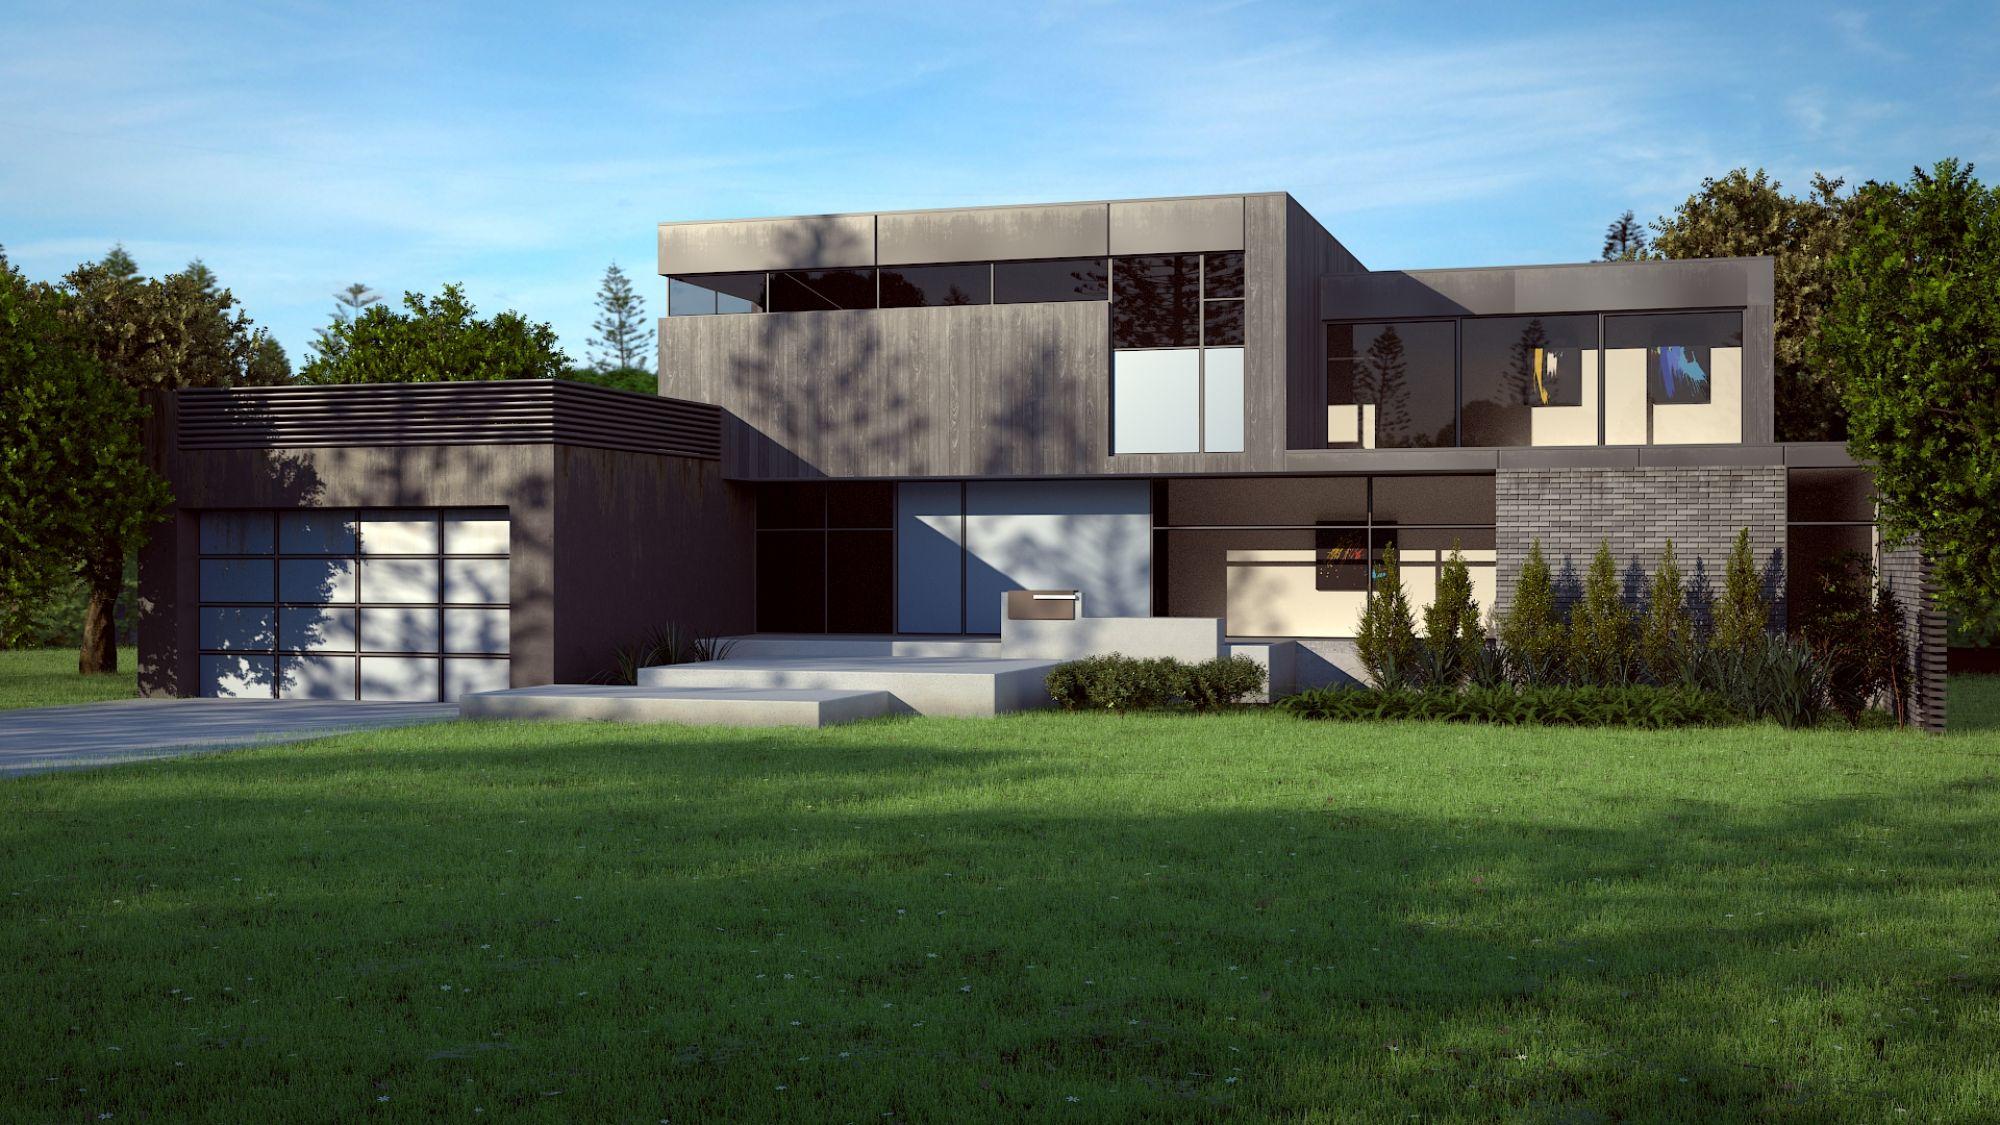 Idei ingenioase de amenajare a casei ntr un stil modern for Casa moderna romania